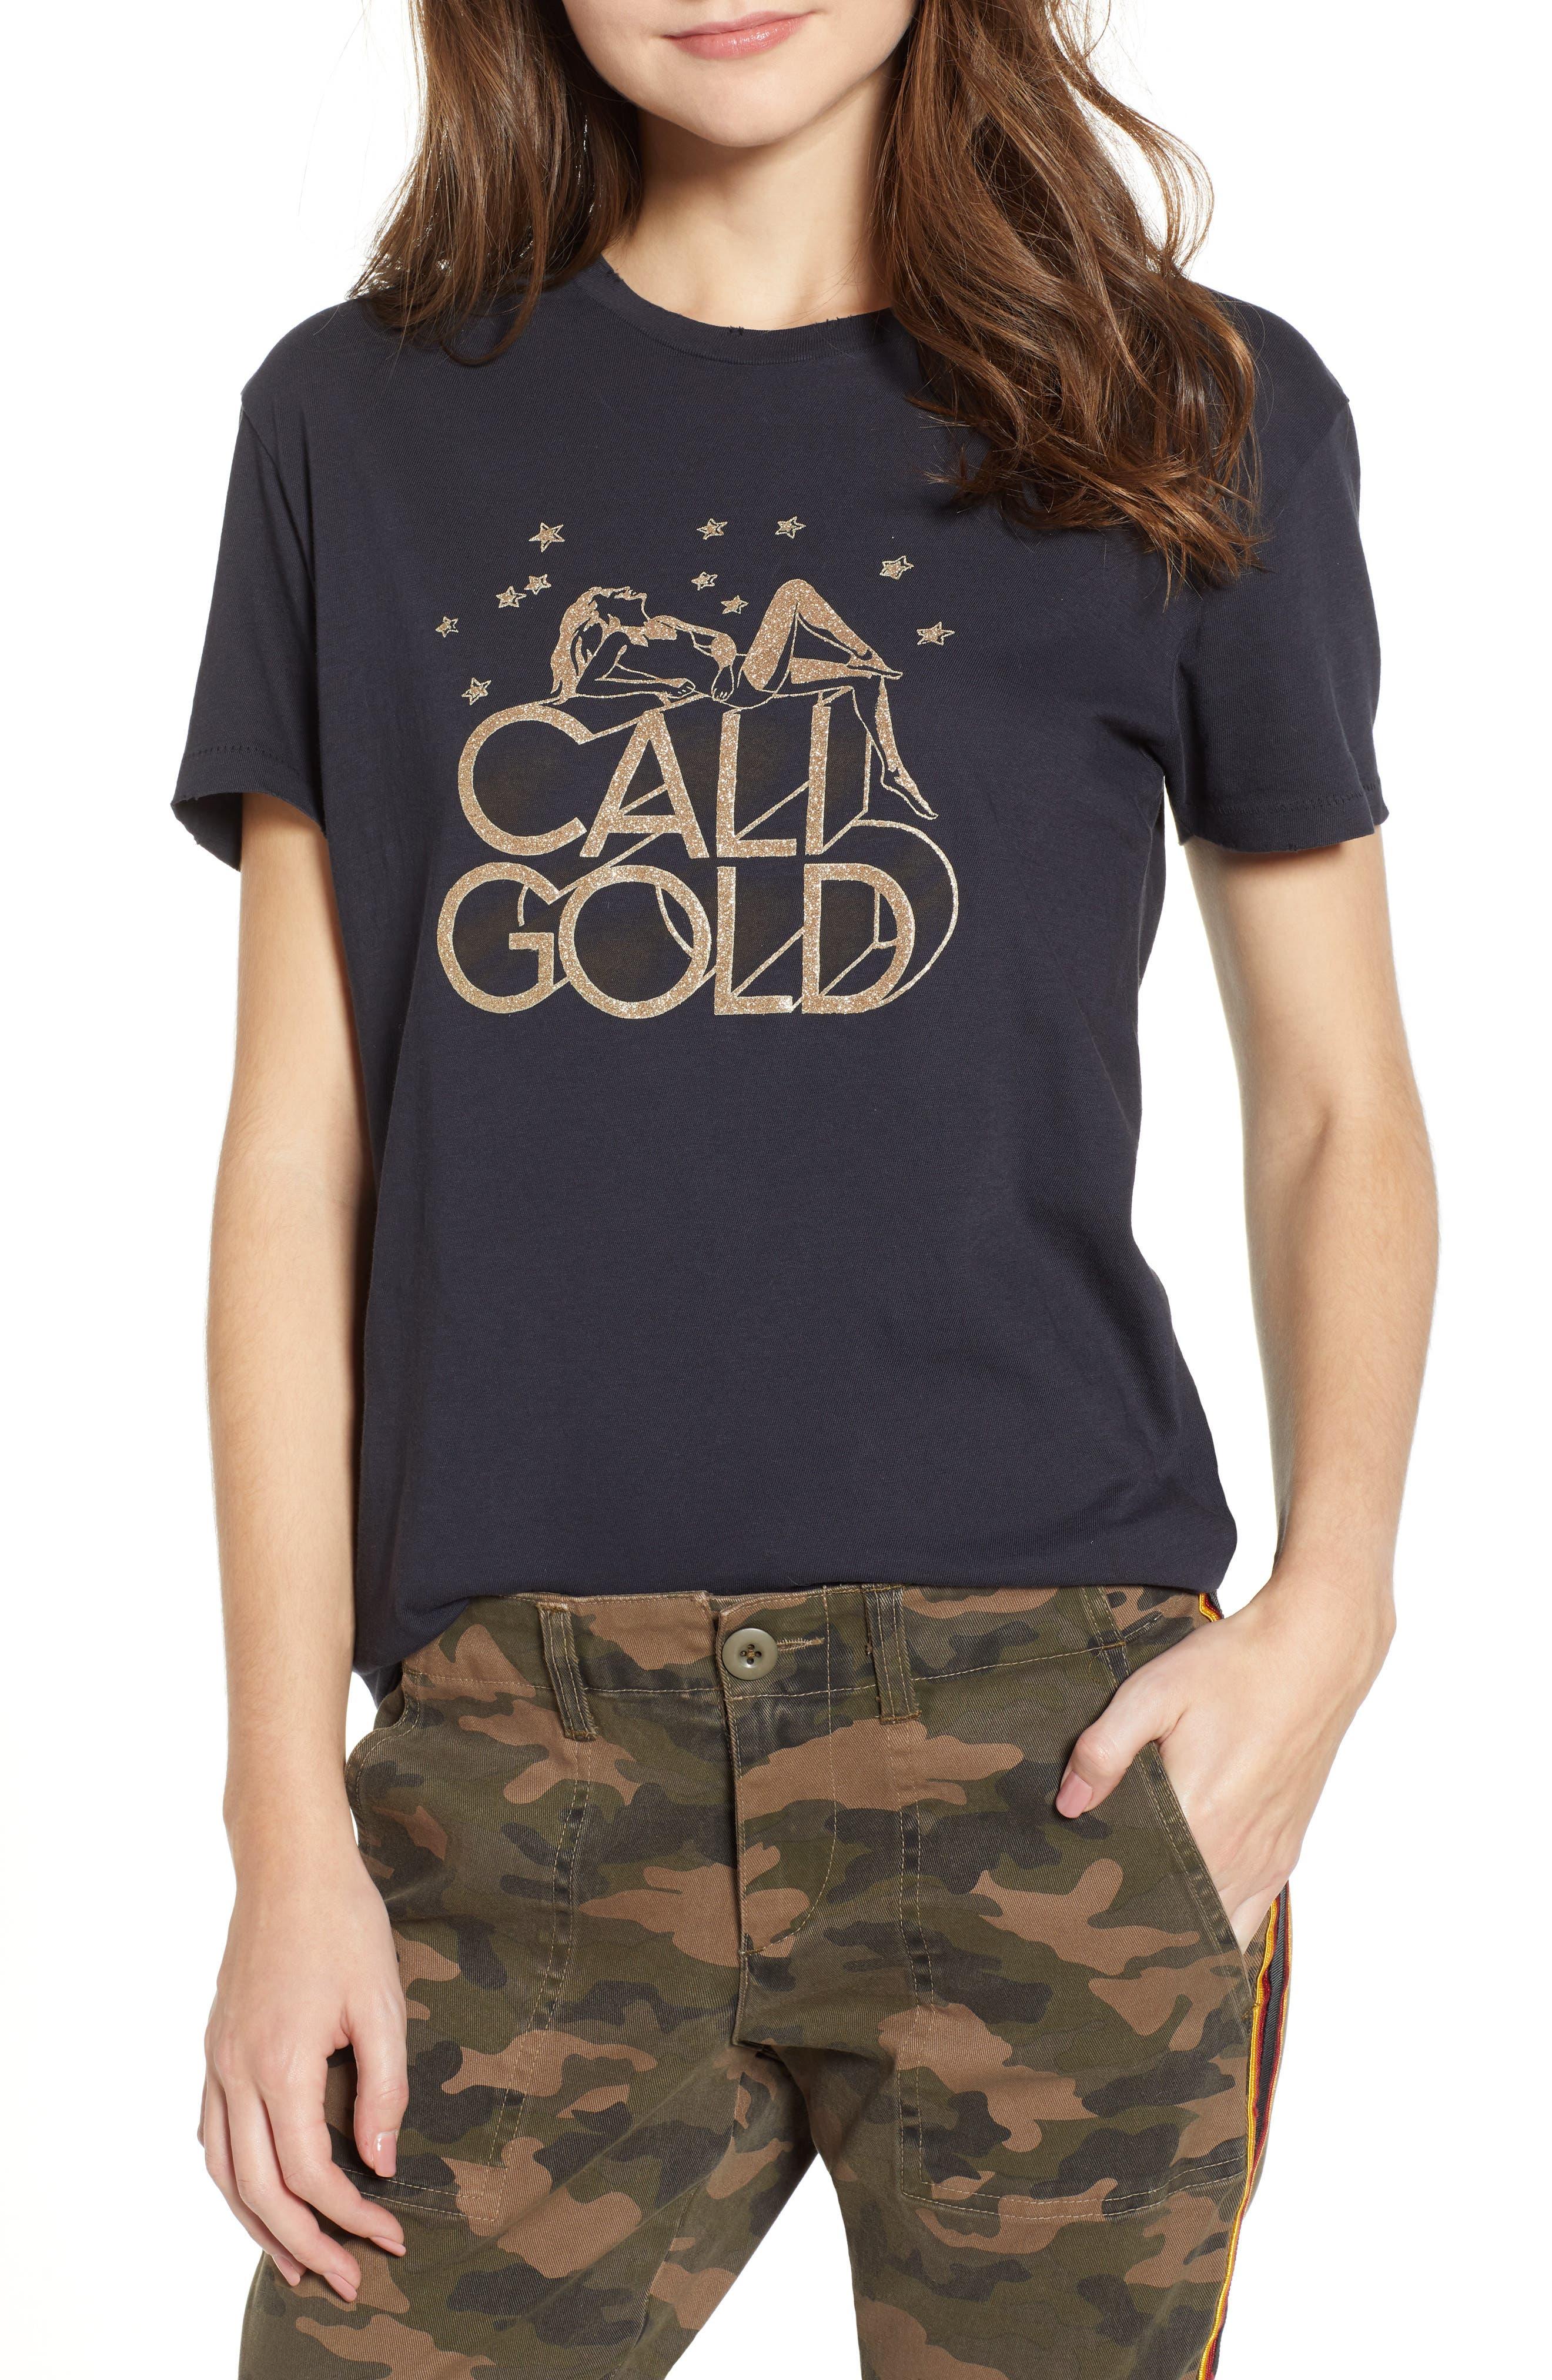 Cali Gold Tee,                             Main thumbnail 1, color,                             FADED BLACK